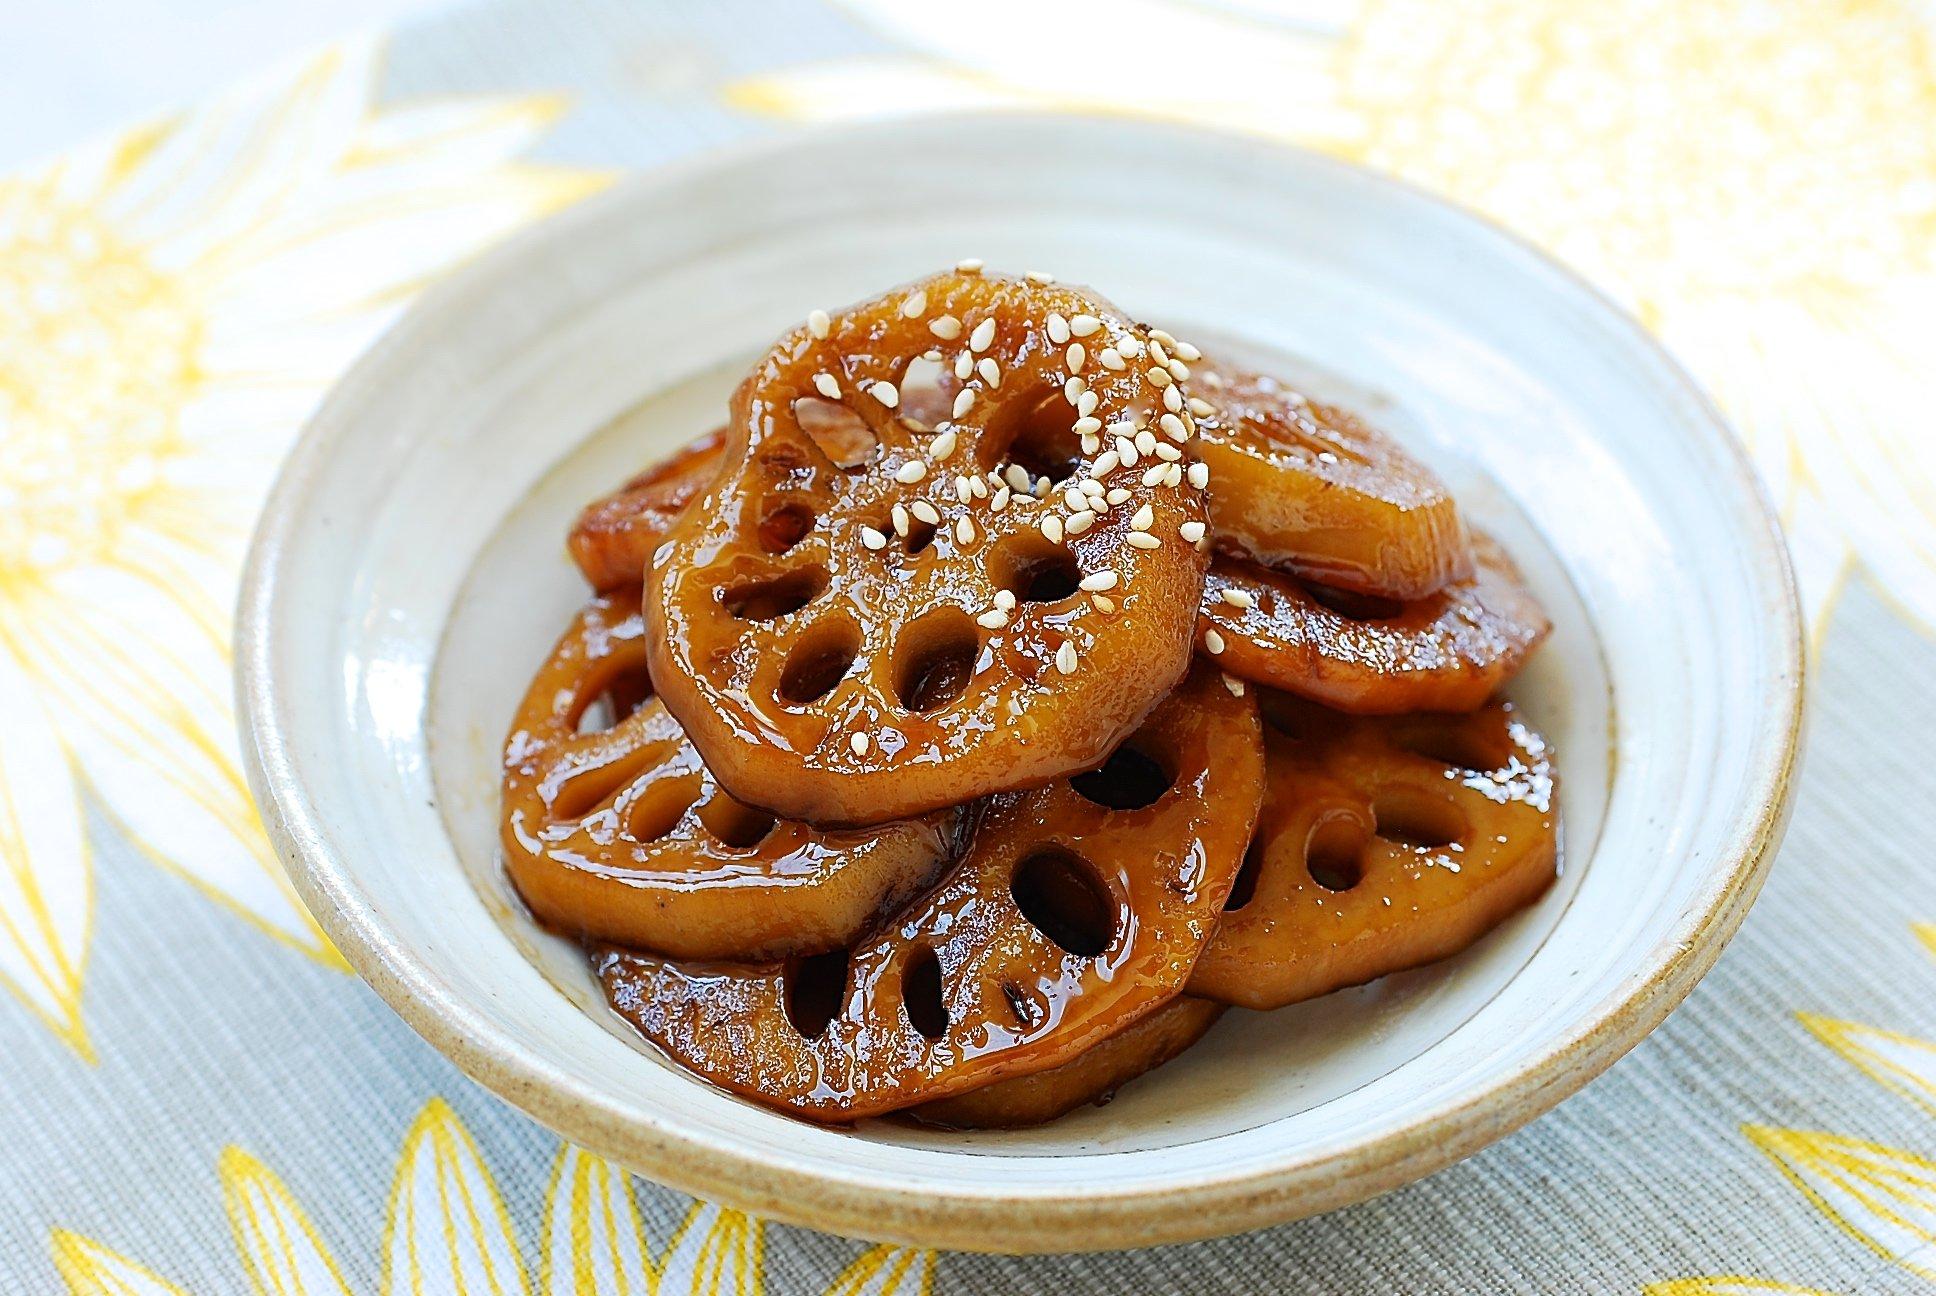 DSC 1890 - Yeongeun jorim (Sweet Soy Braised Lotus Roots)